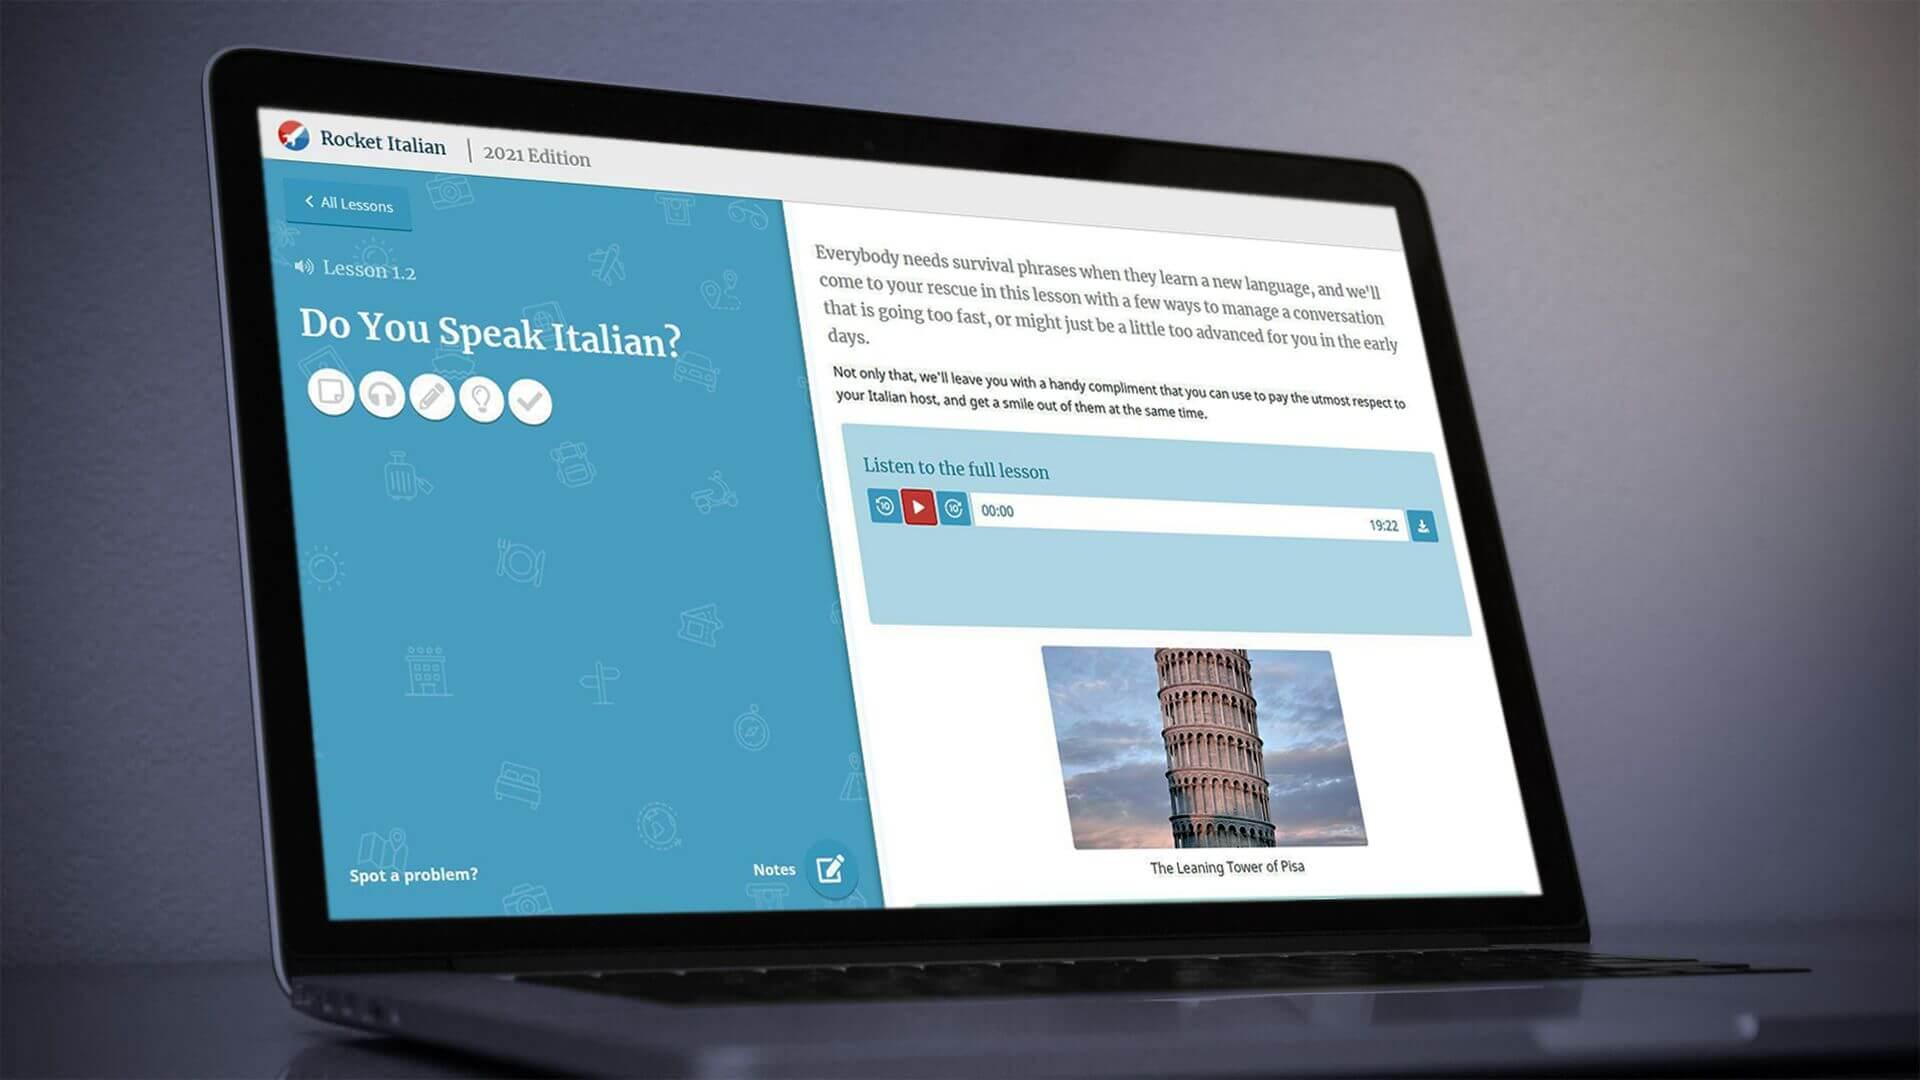 Rocket Italian Review 2021